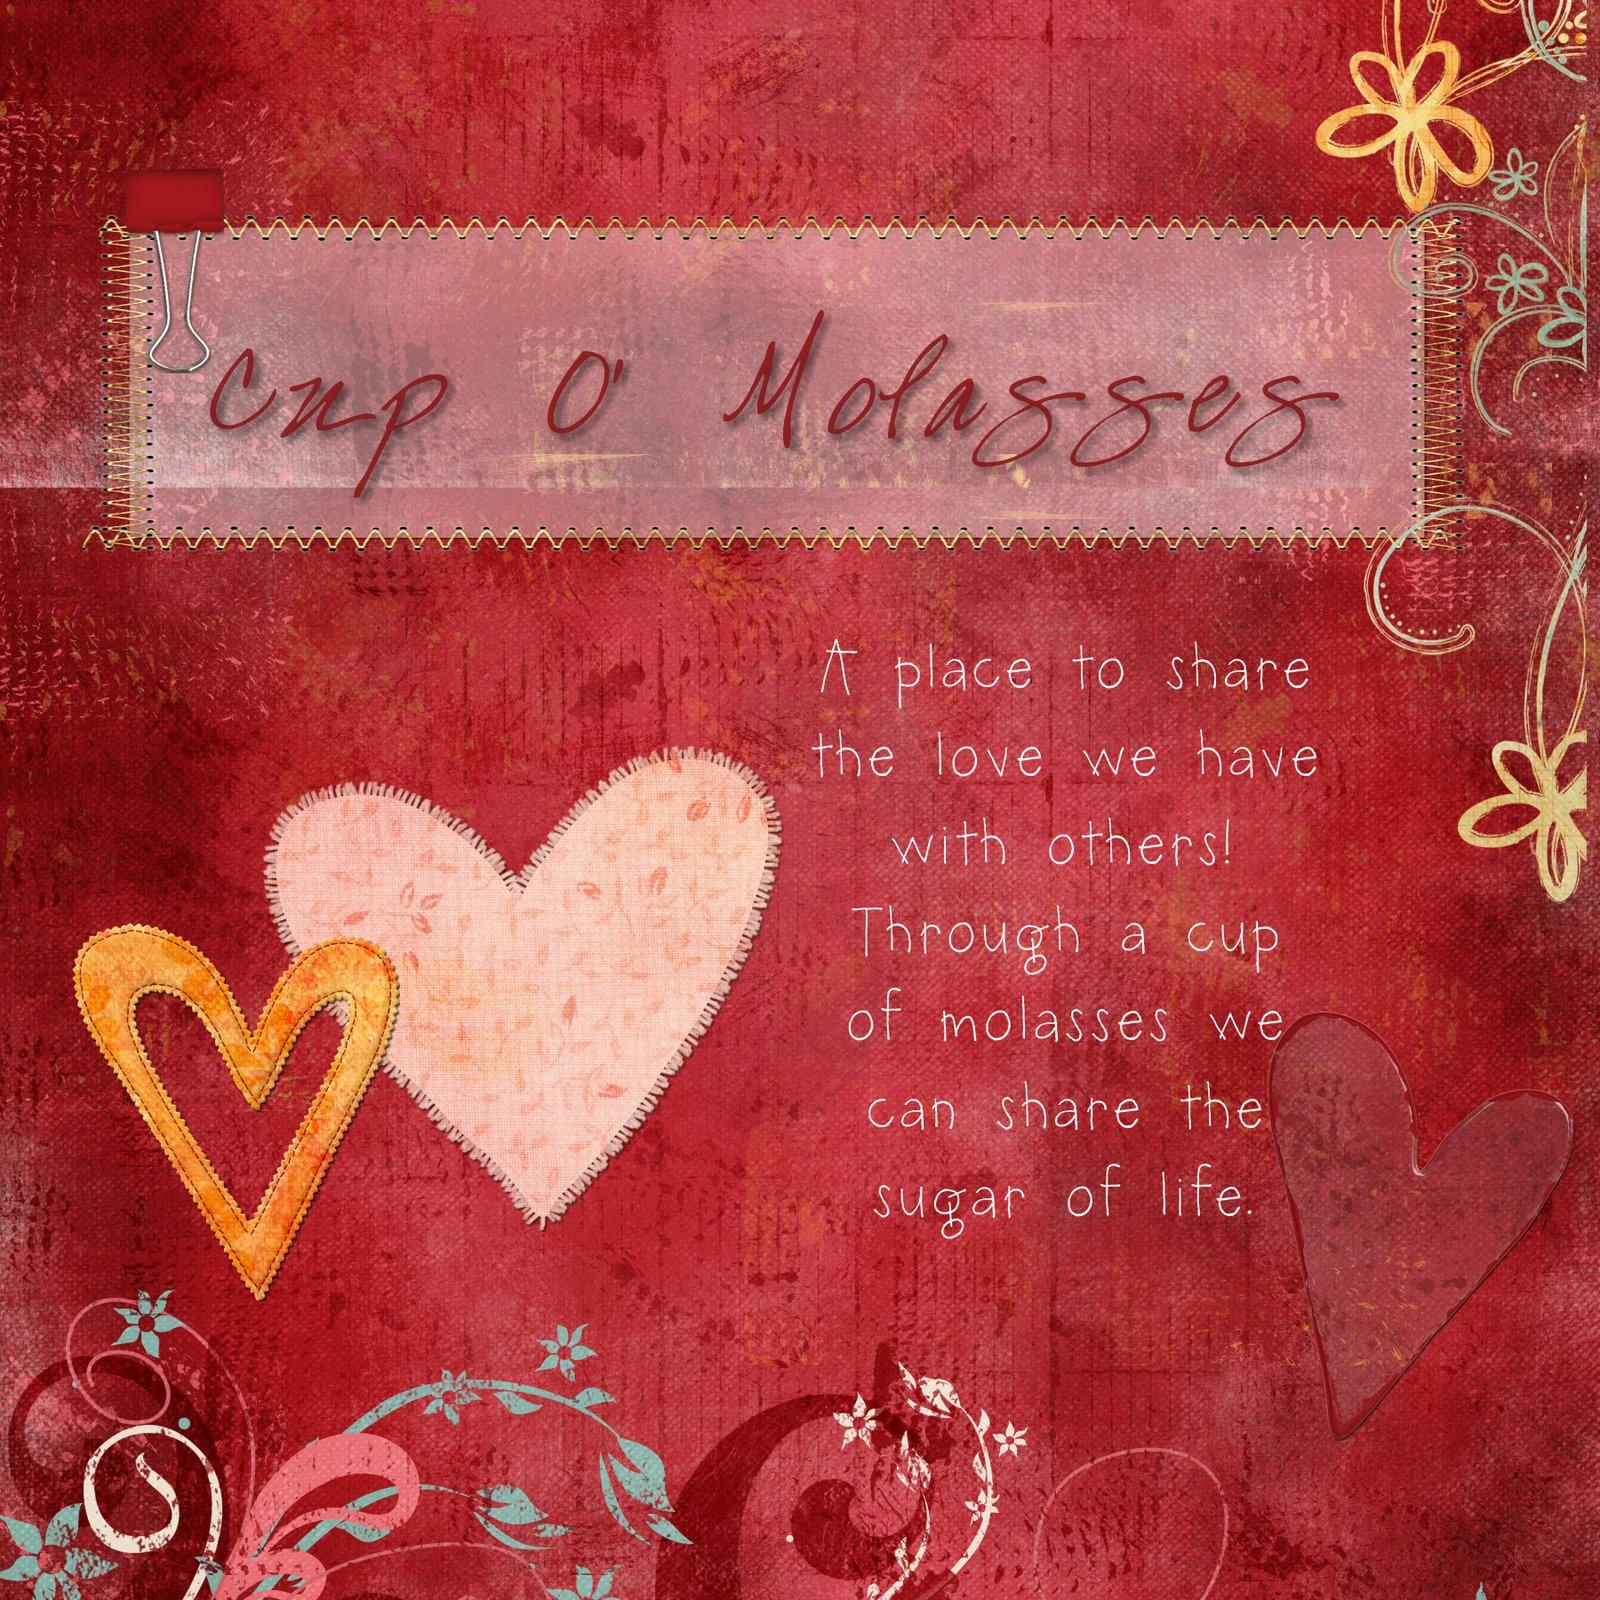 Cup O' Molasses